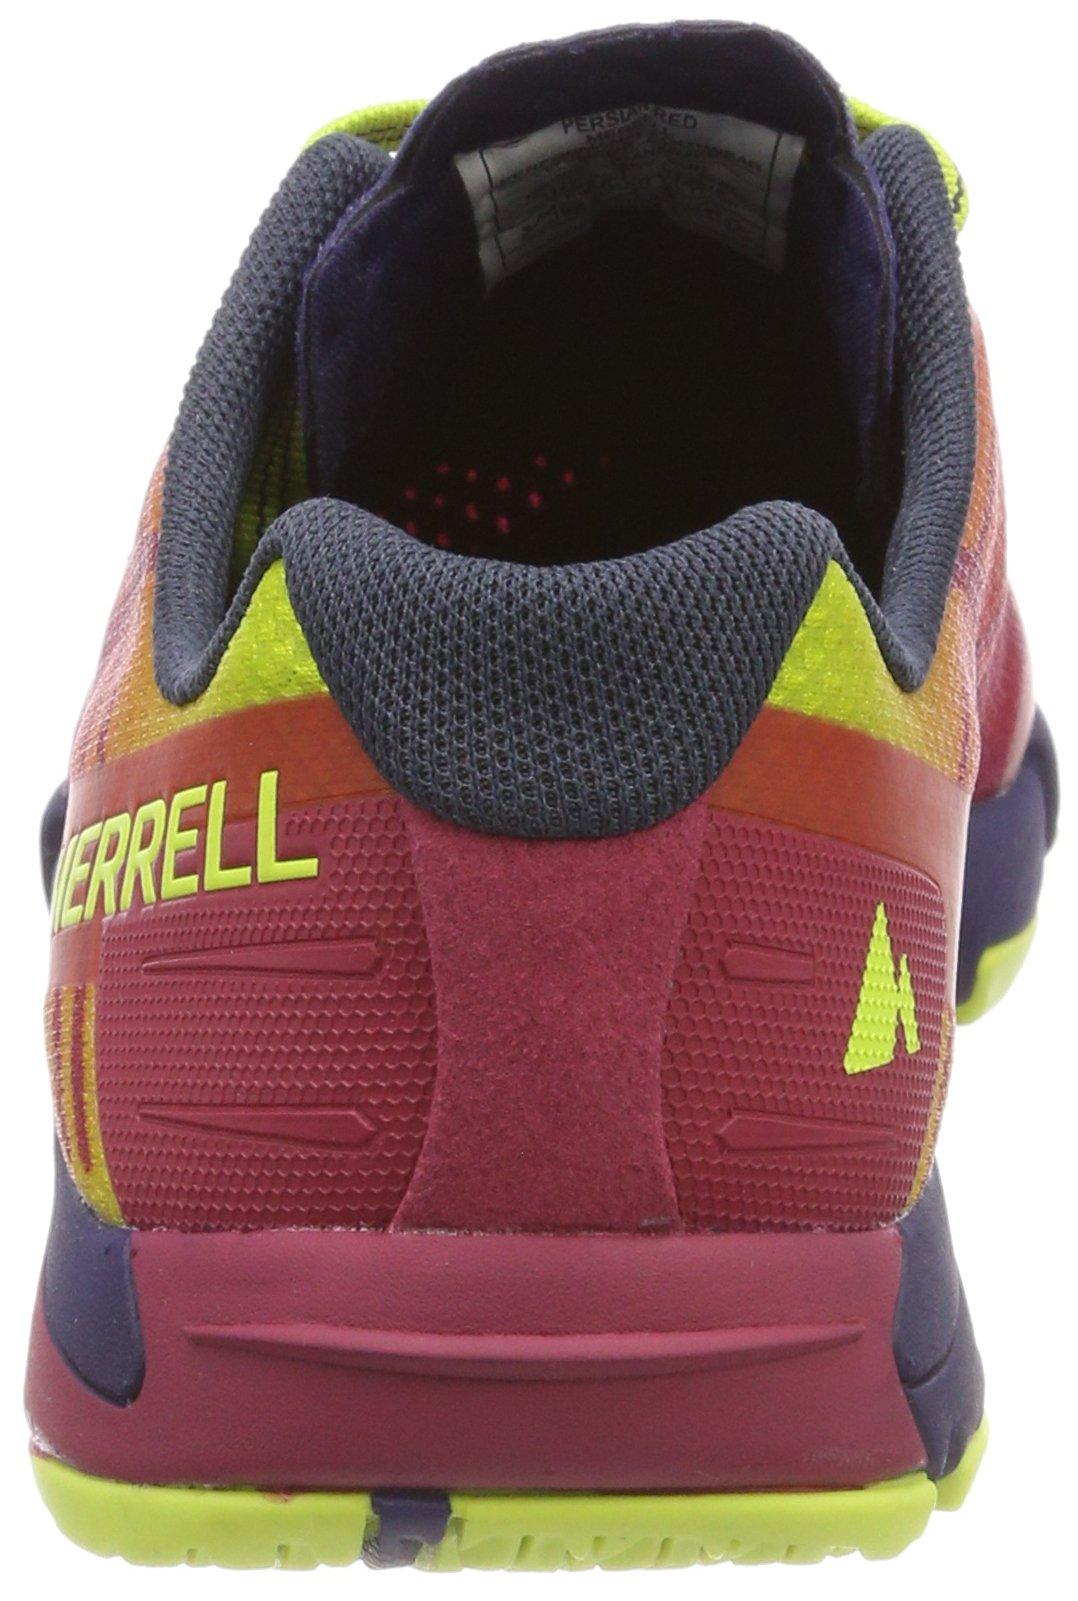 719wGgYI6wL - Merrell Women's Bare Access Flex Trail Runner